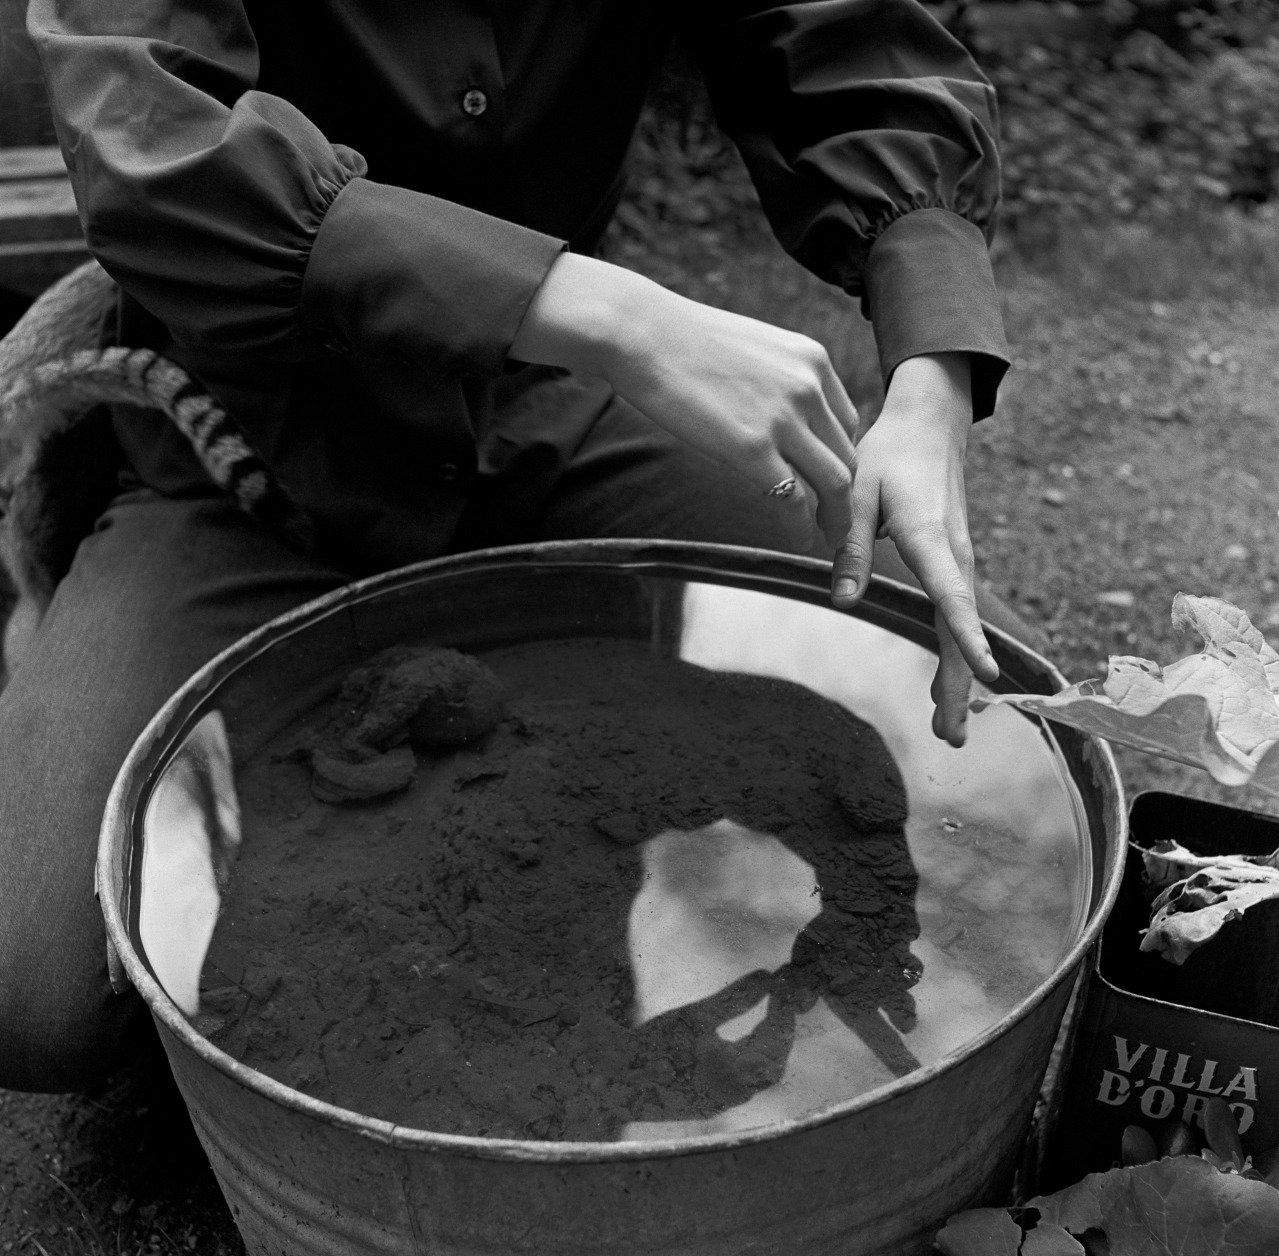 Le mani di Aiko, 1971 © Imogen Cunningham